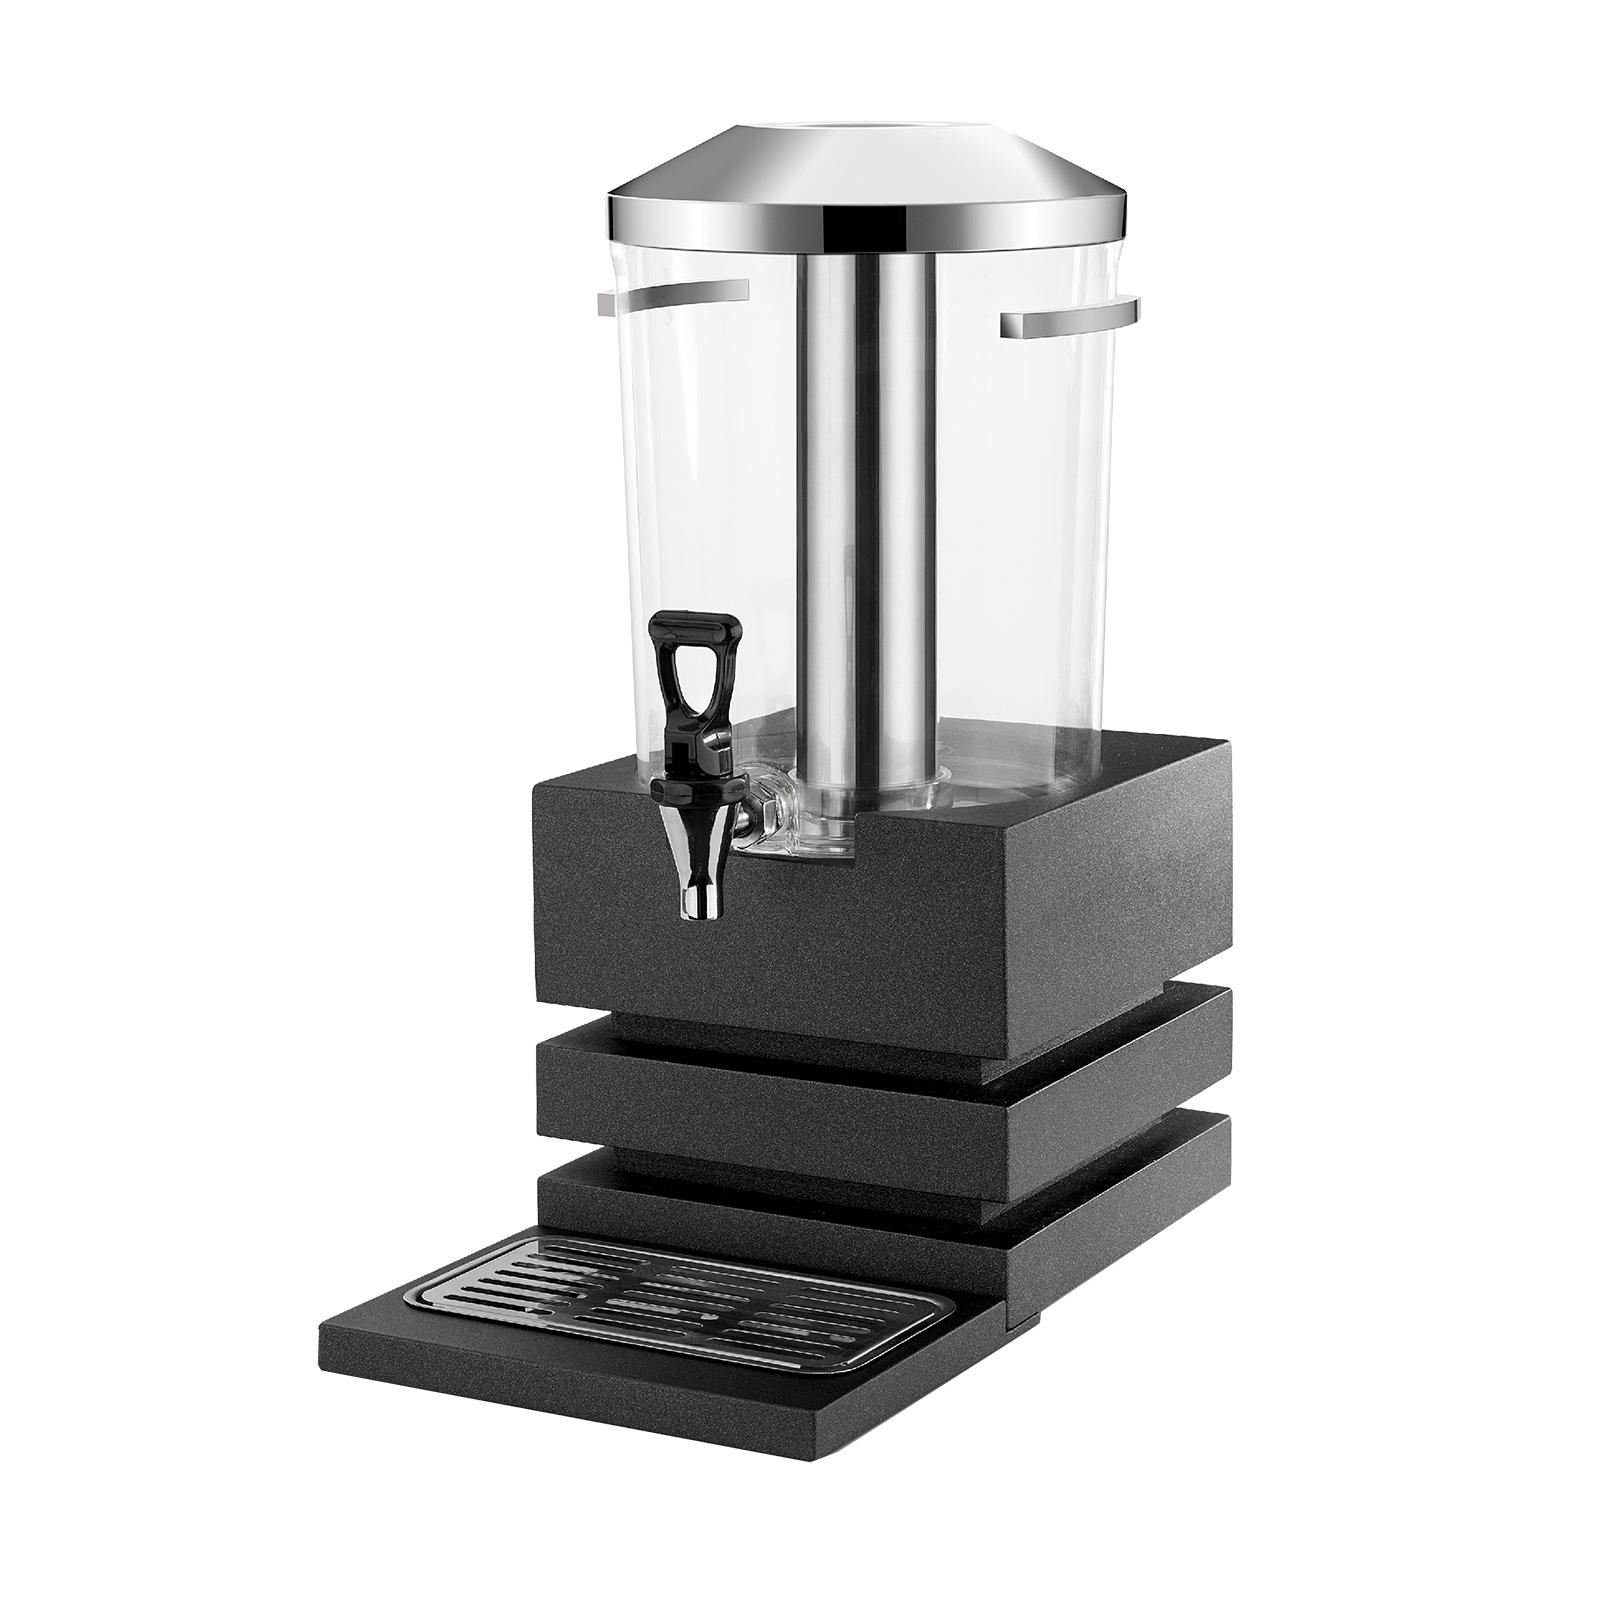 Vollrath V904800 beverage dispenser, non-insulated